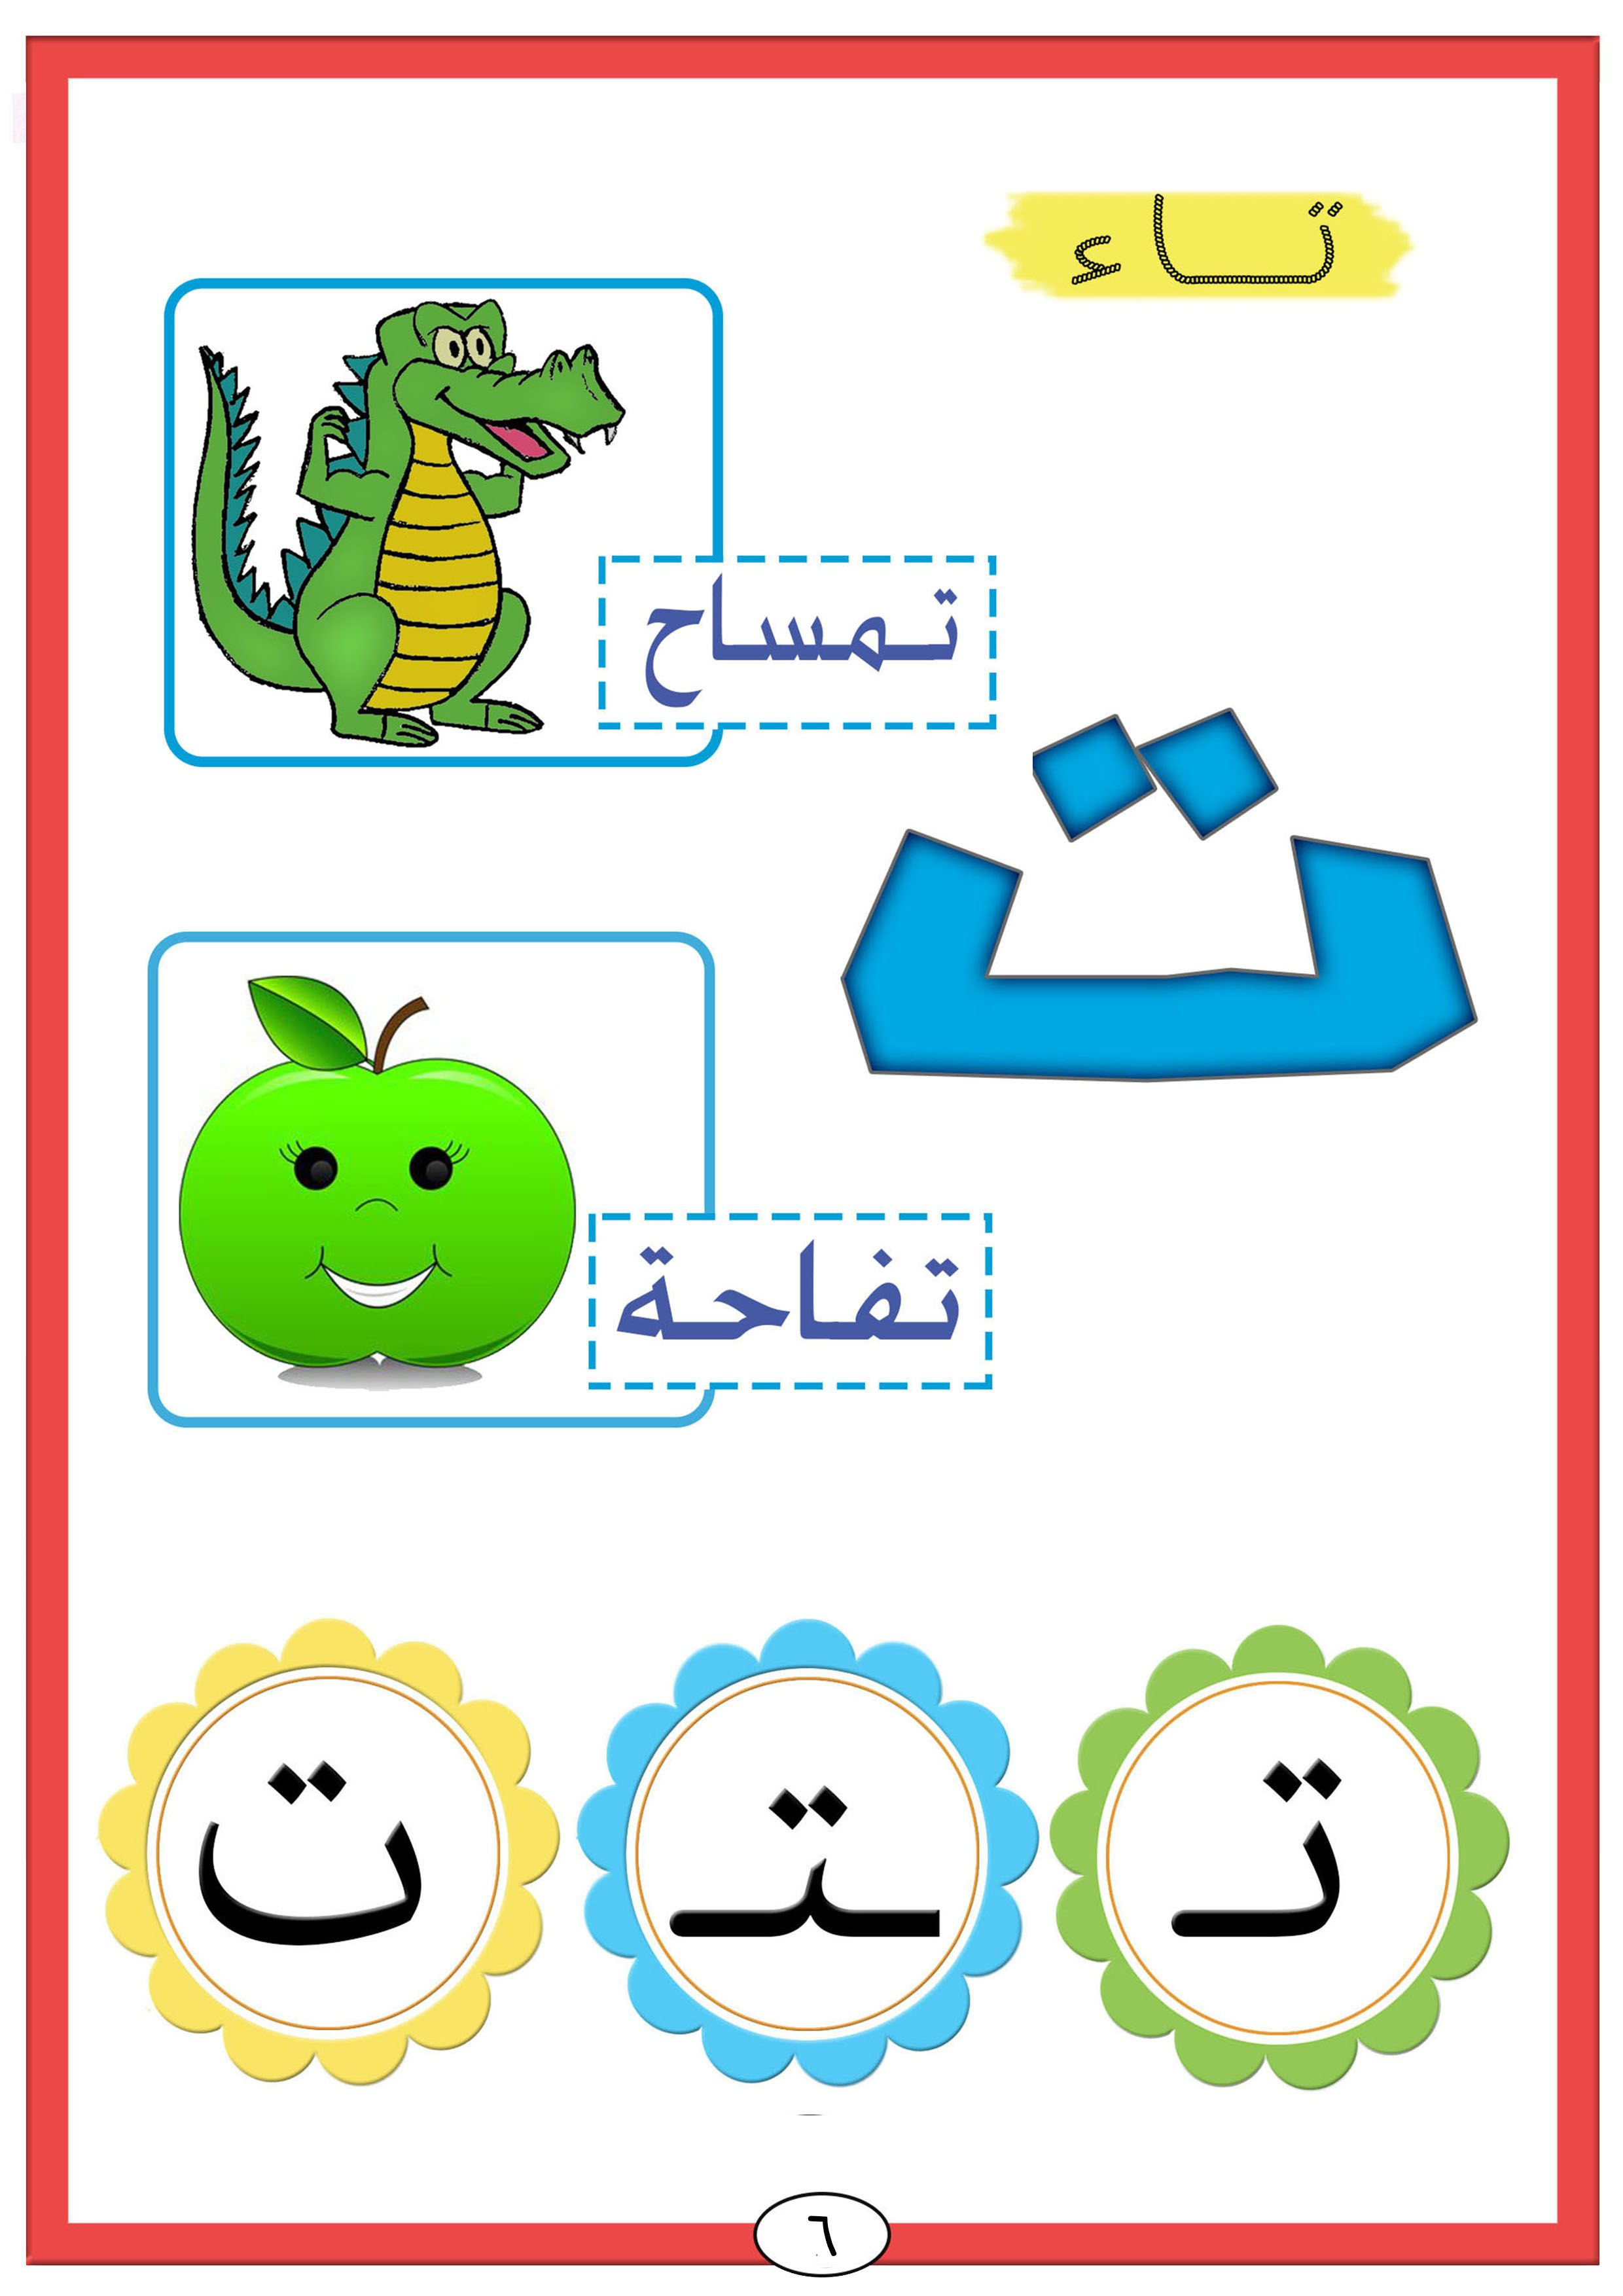 how to learn arabic alphabet reddit